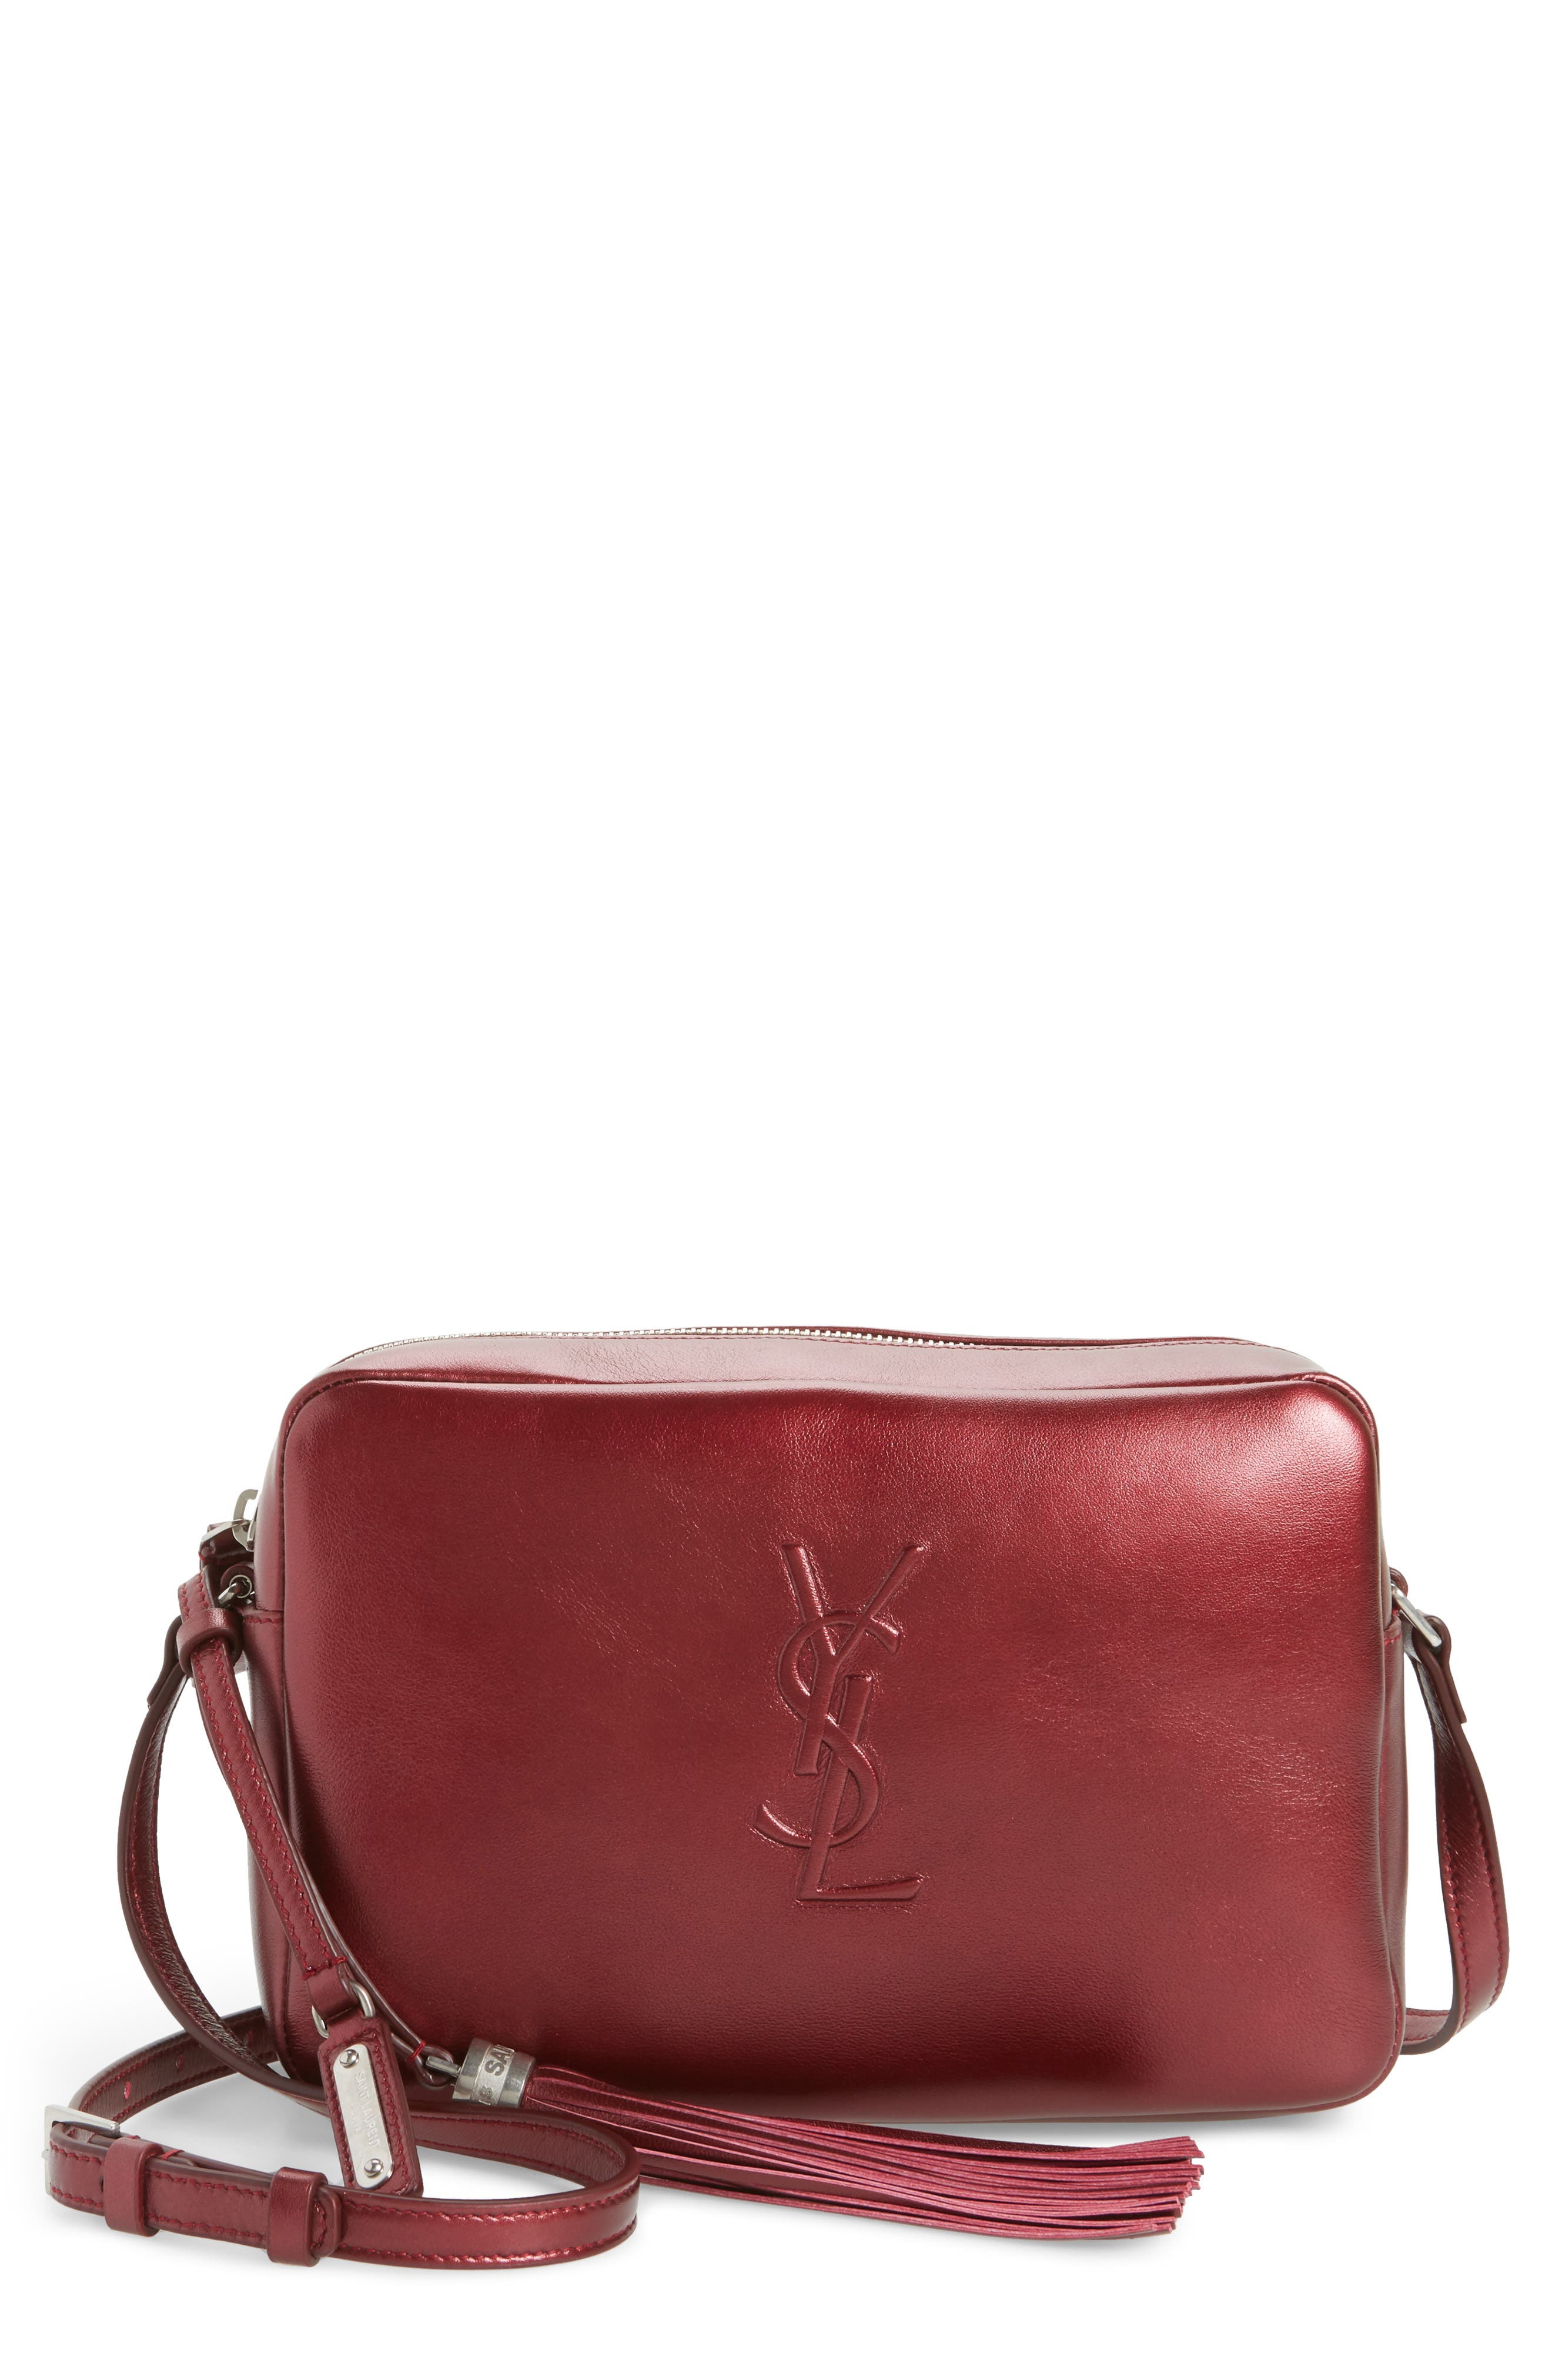 Saint Laurent Medium Lou Calfskin Leather Calfskin Camera Bag